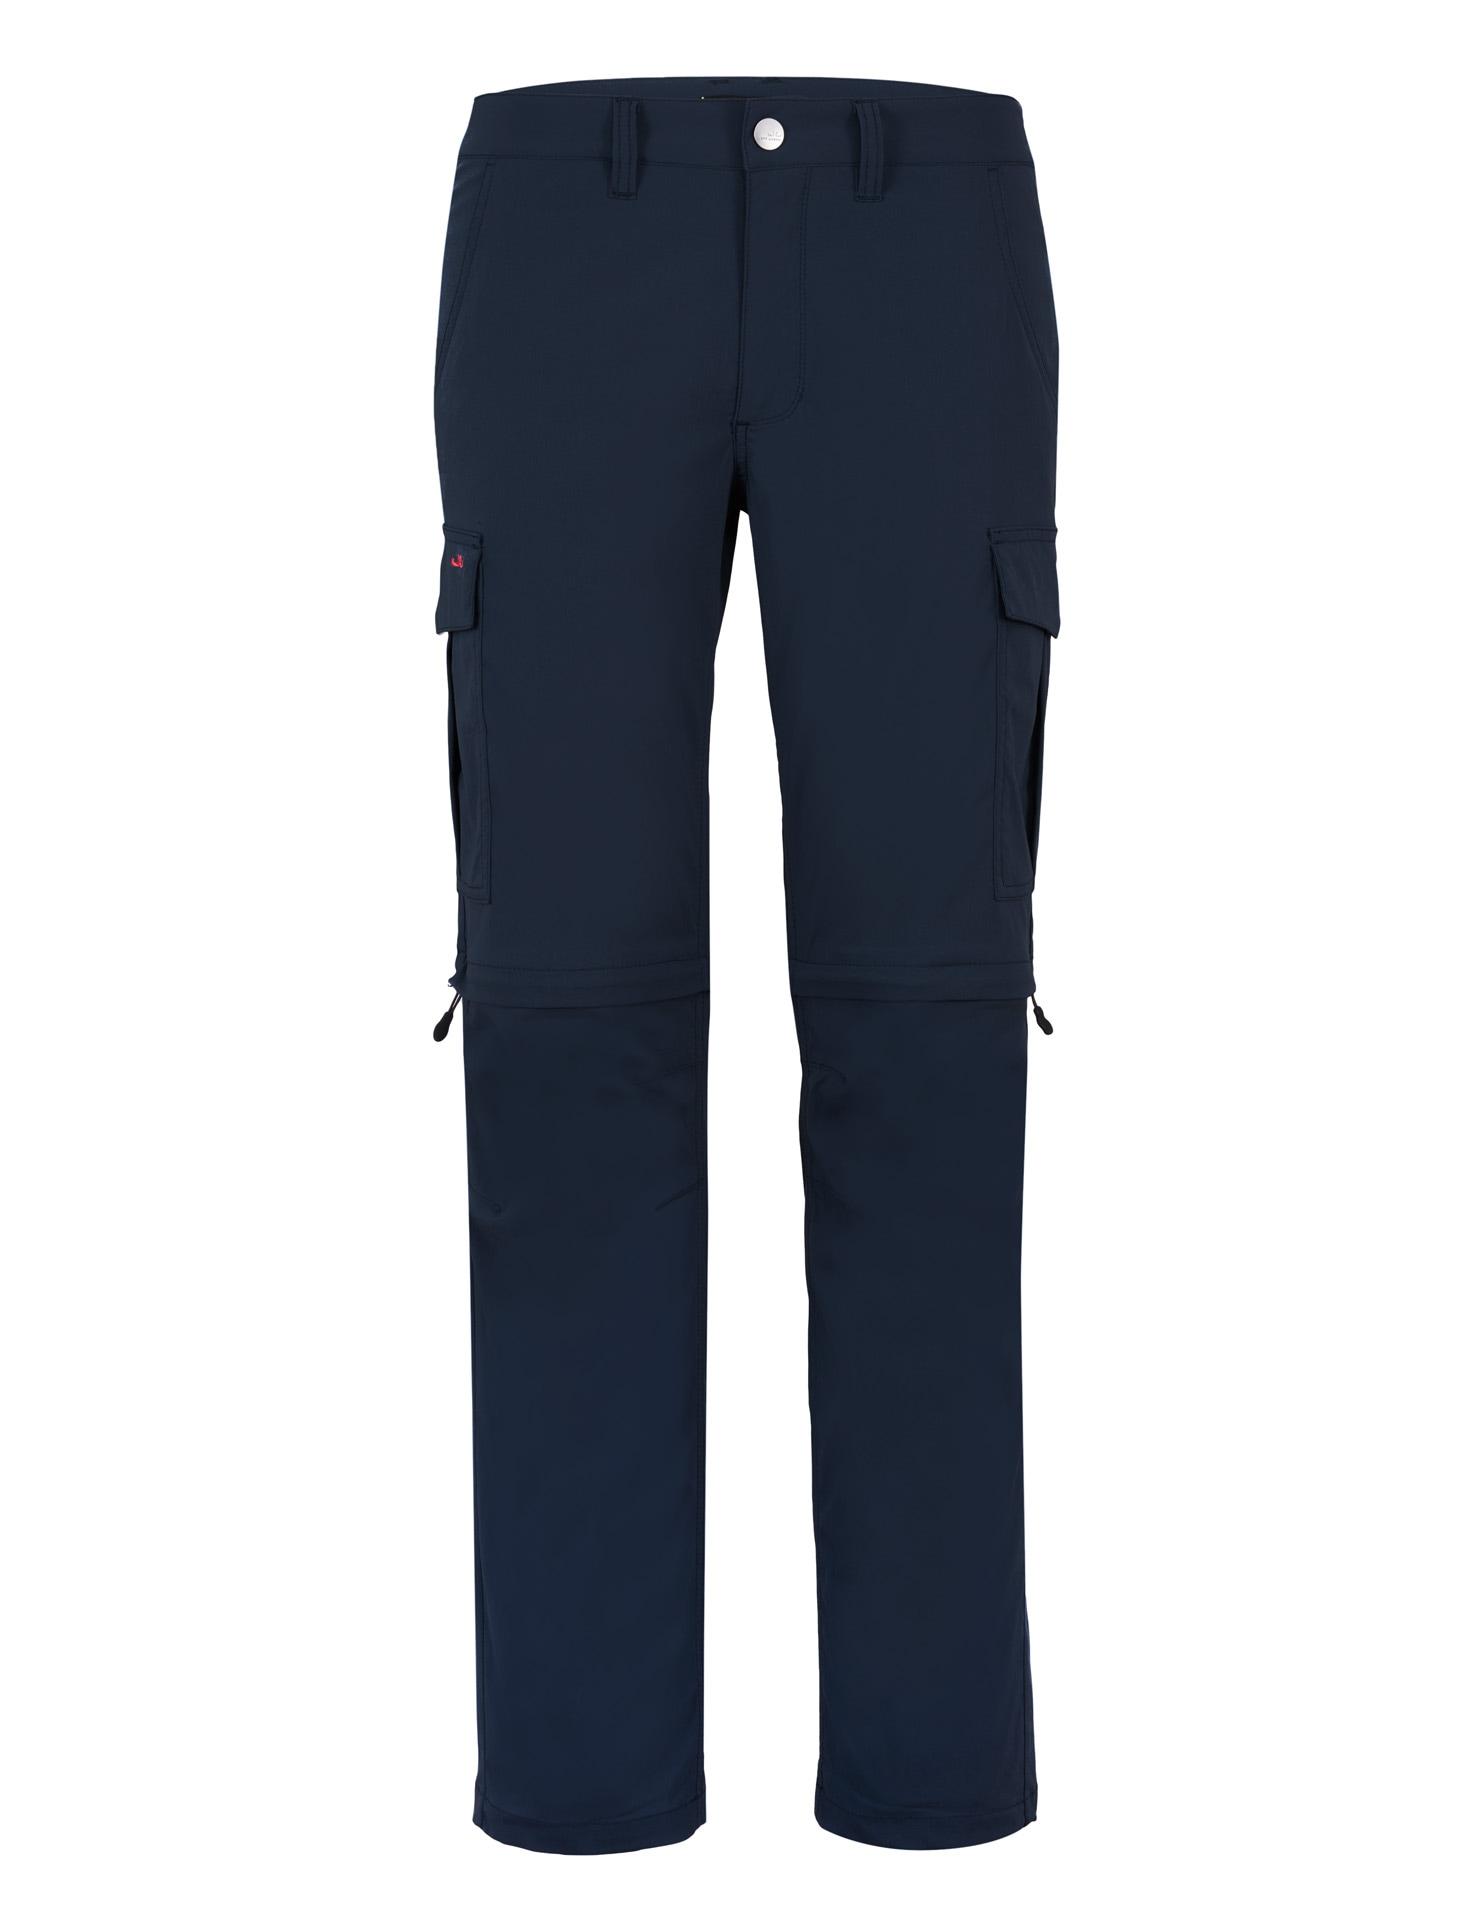 Jeff Green Zip-off-Hose Phill blau Herren Zipp-Off-Hosen Outdoorhosen Hosen